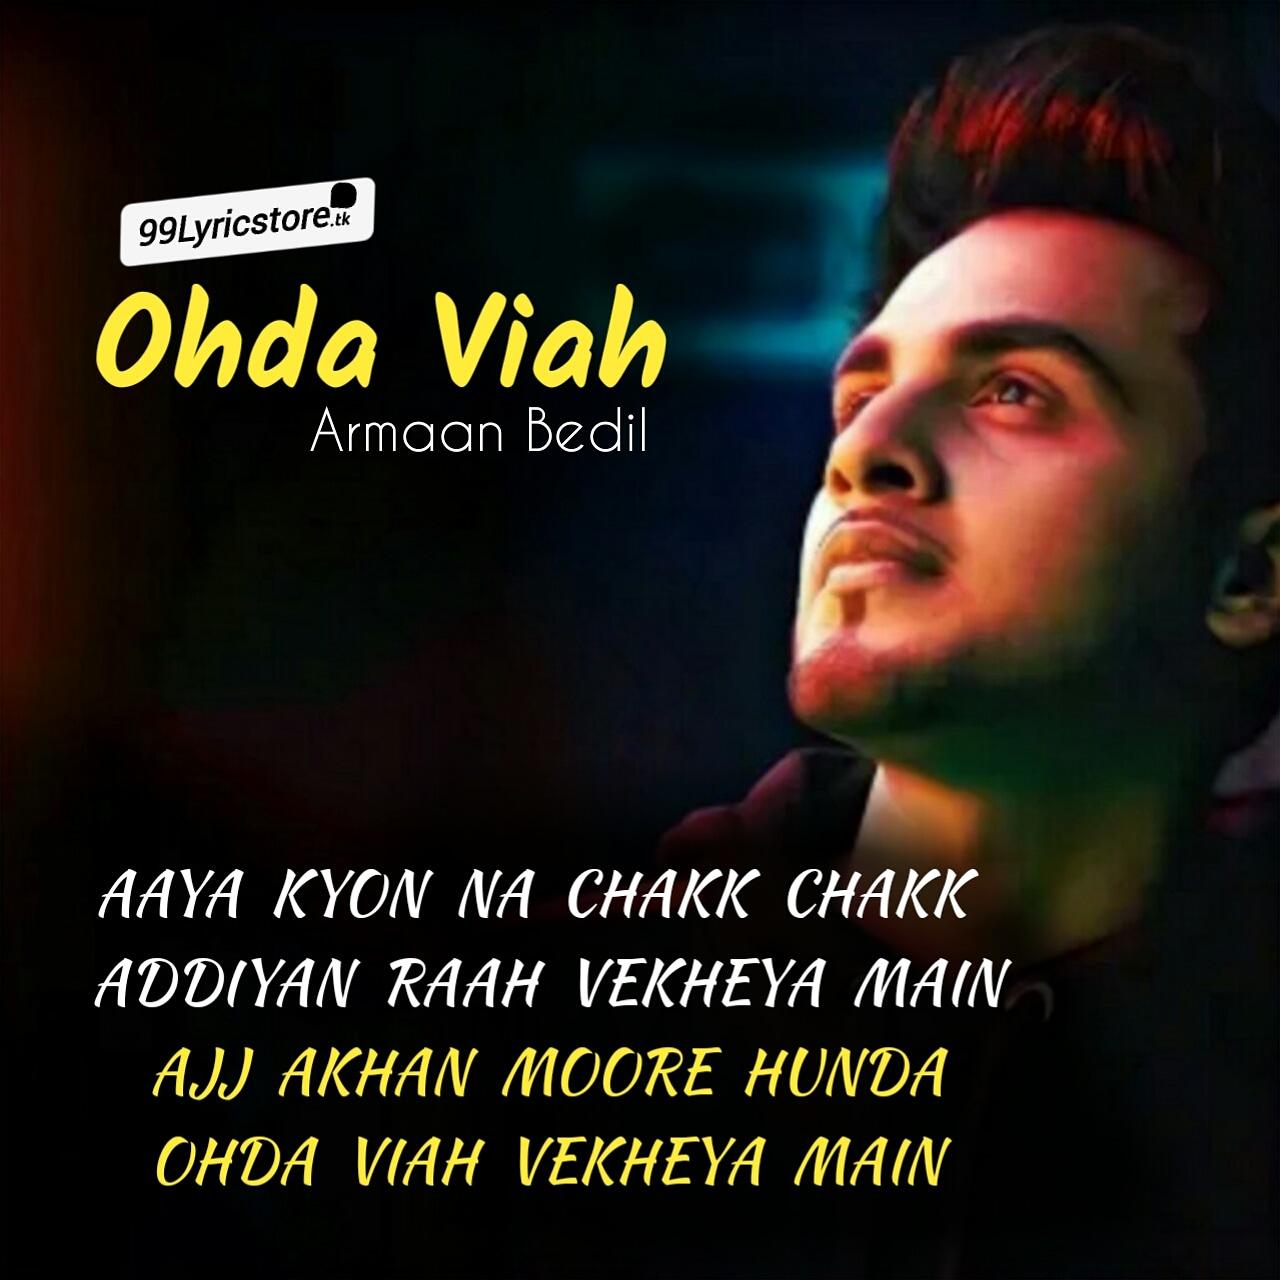 Ohda Viah punjabi song lyrics sung armaan bedil